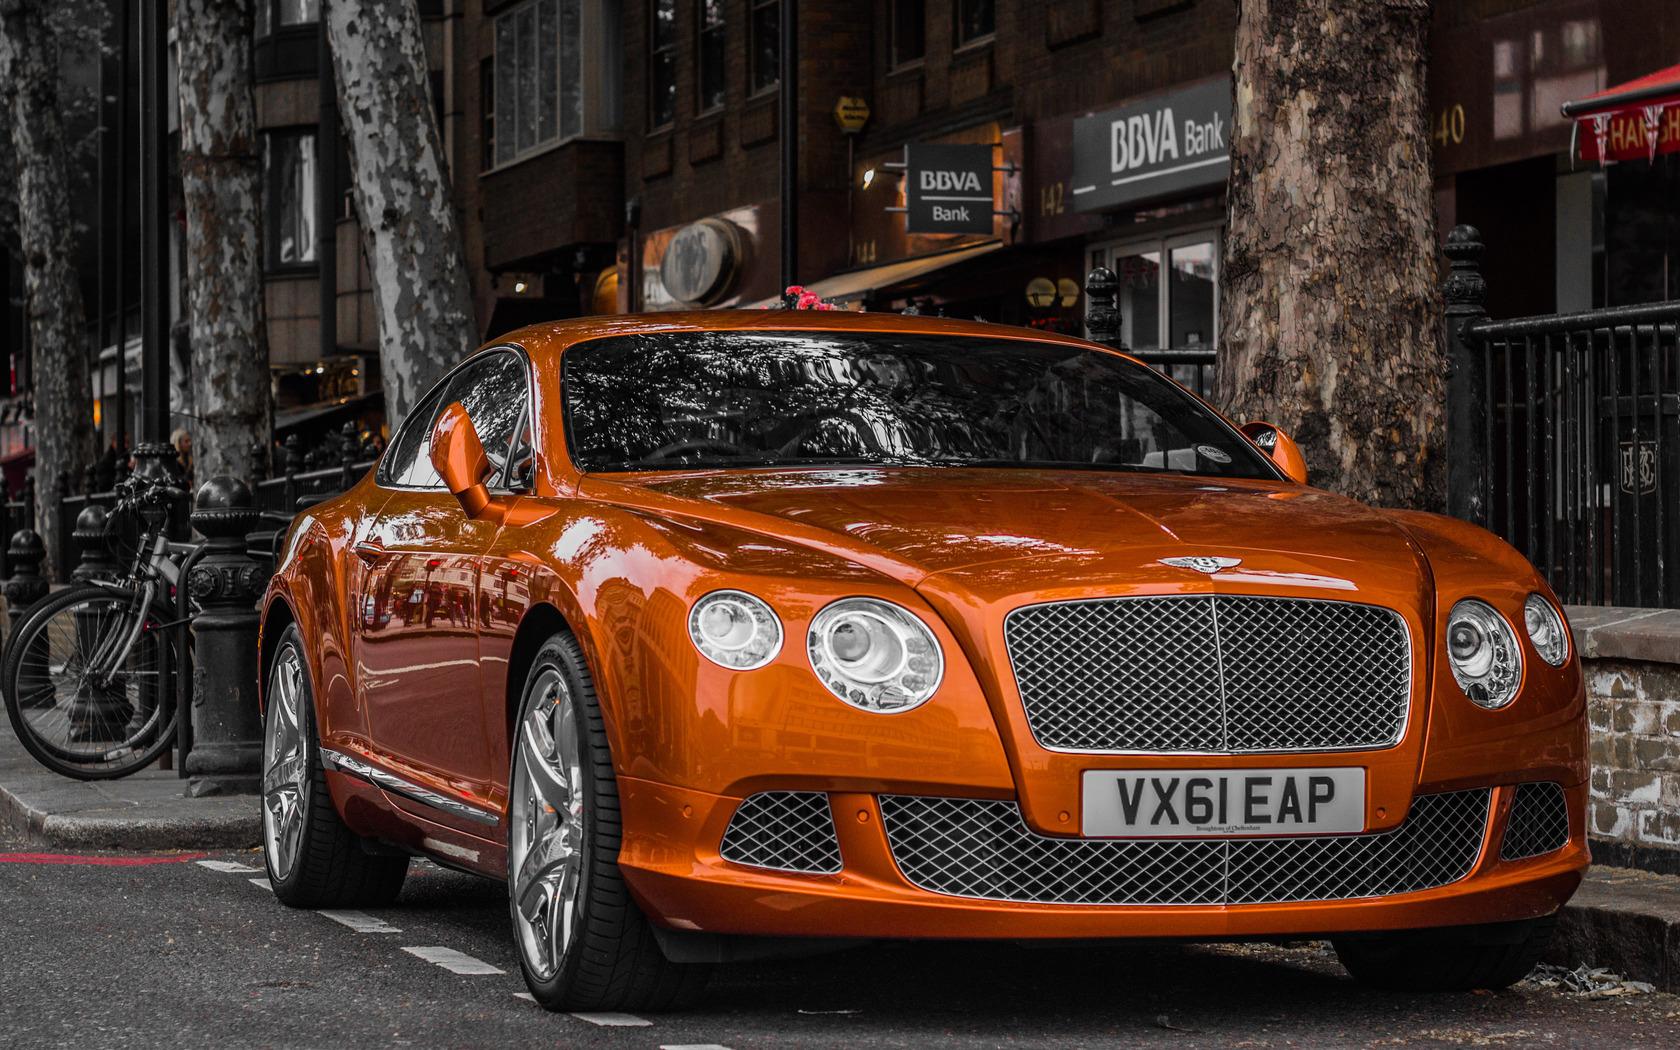 машина оранжевого цвета фото